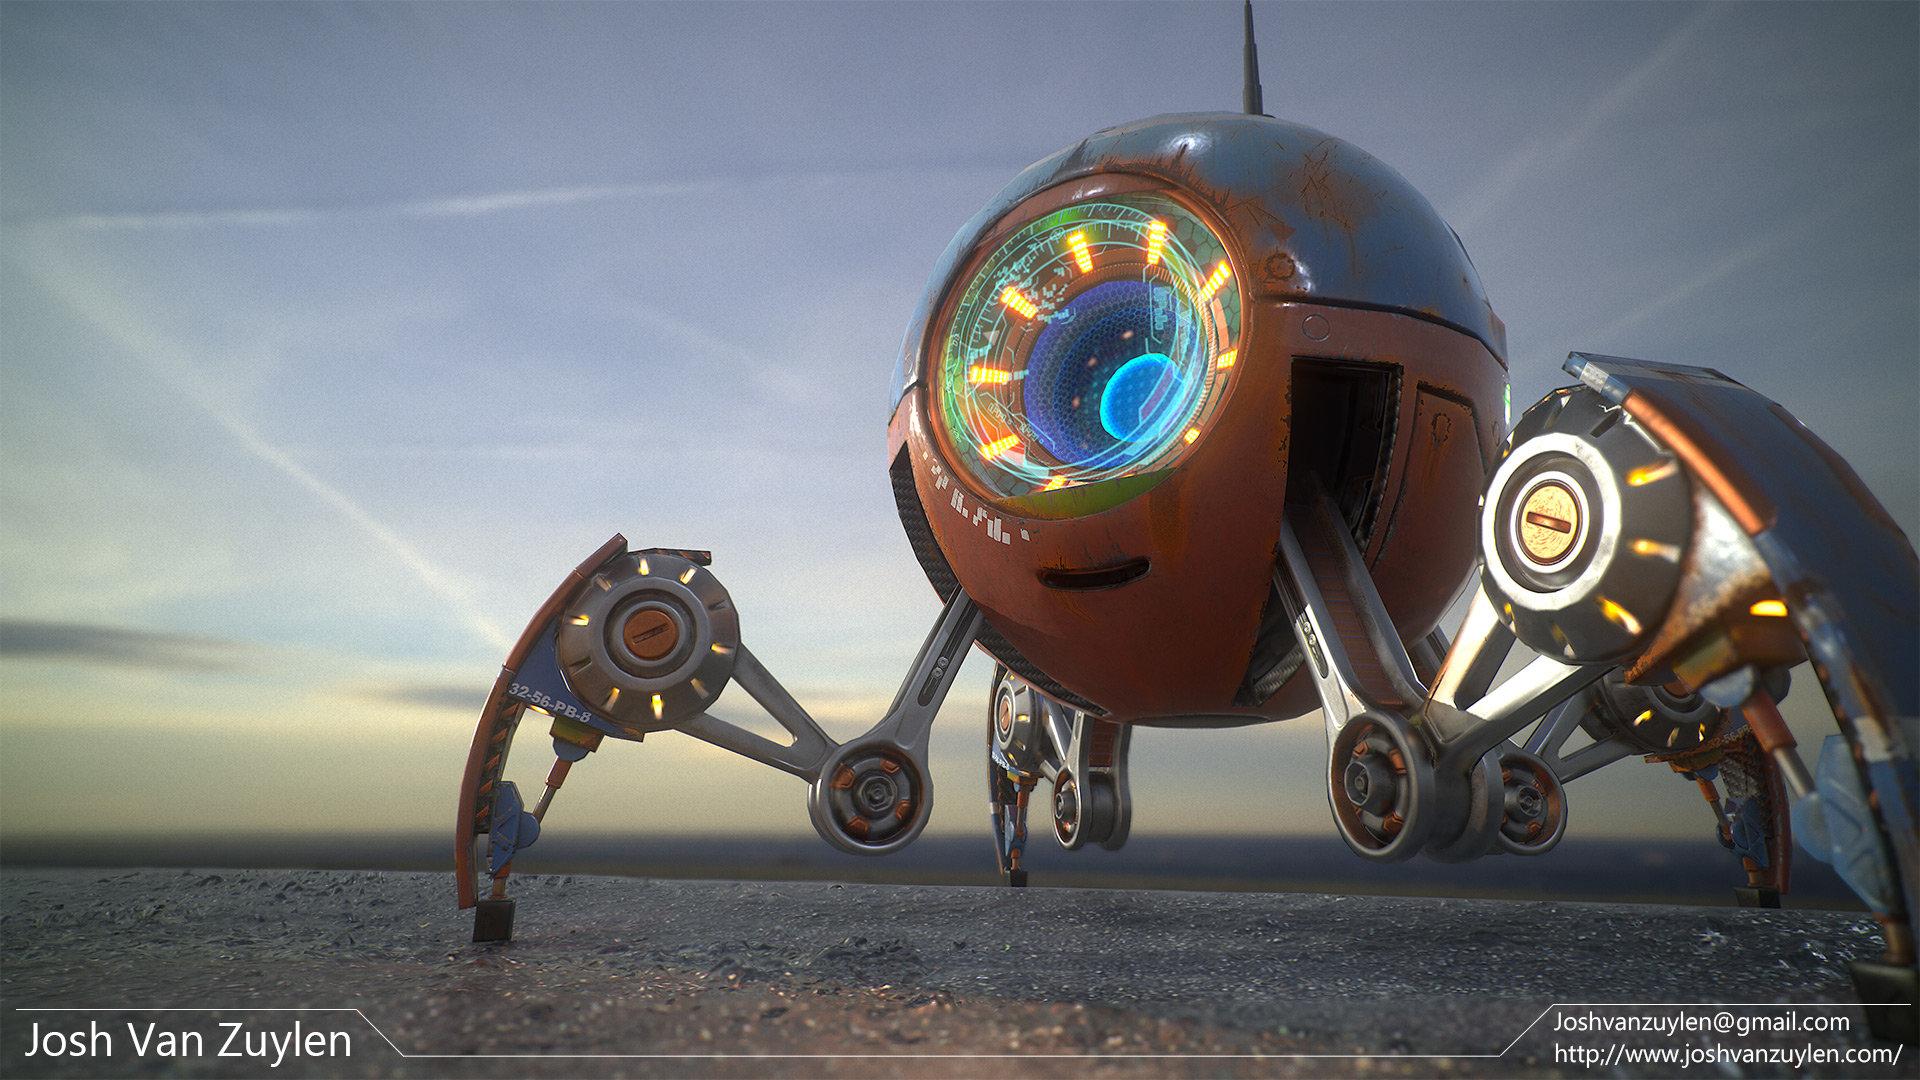 josh-van-zuylen-little-robot-final-2.jpg?1436955581